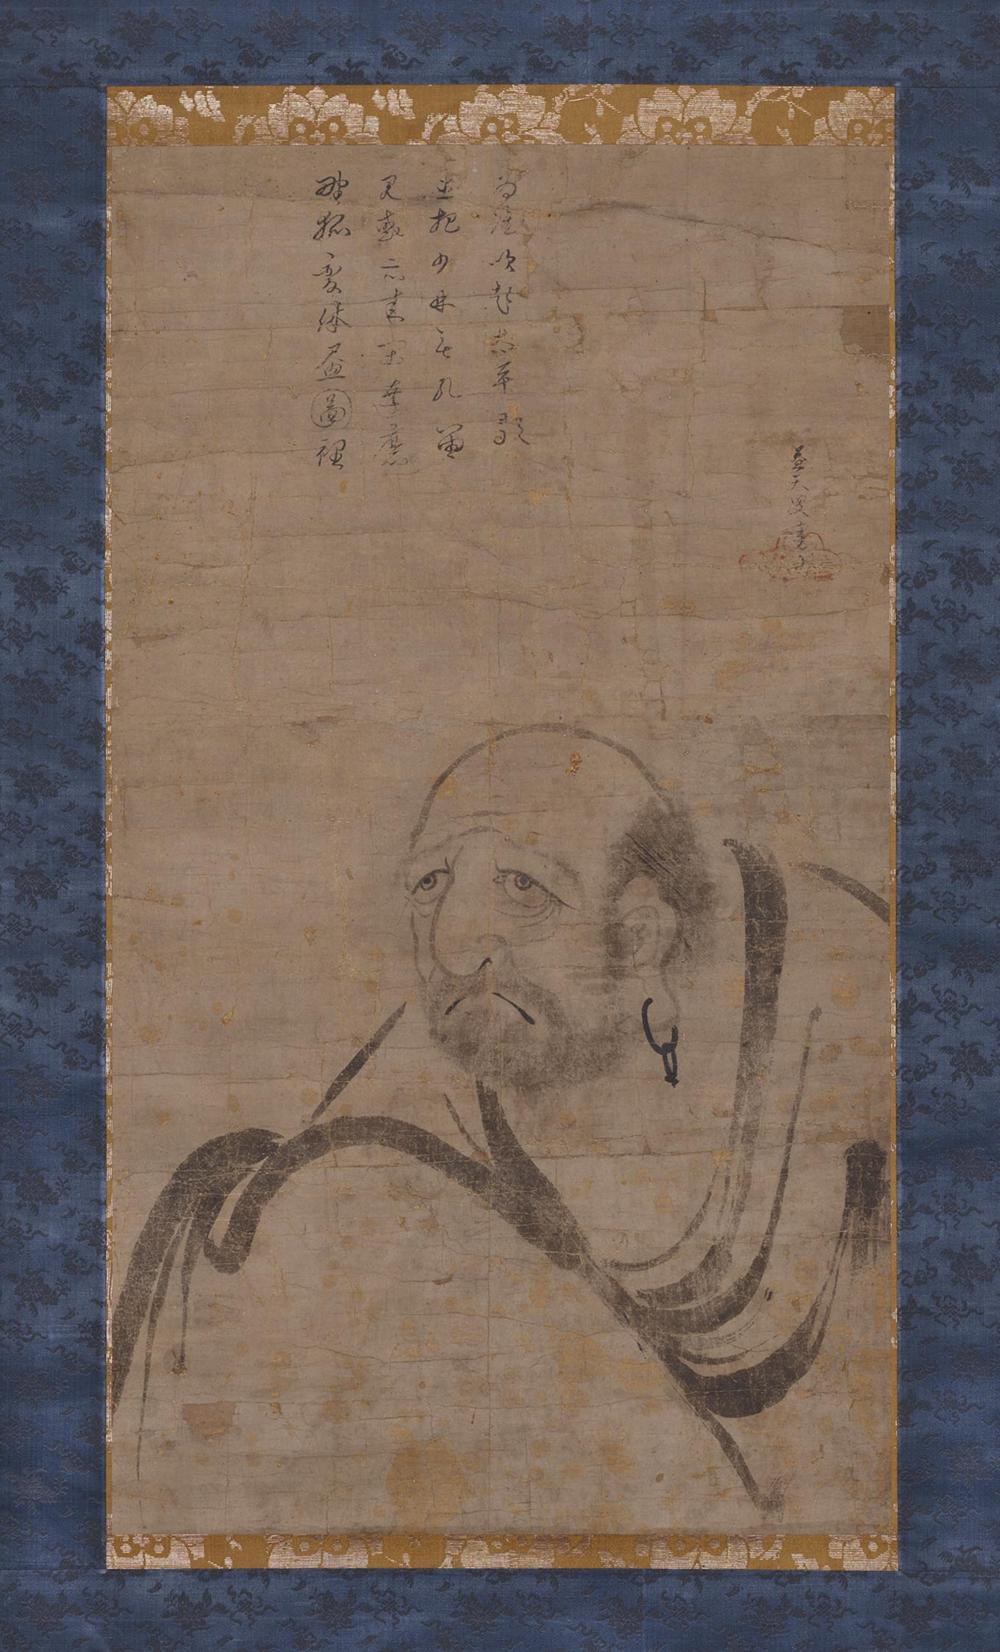 Halbfigurenbild des Zen-Patriarchen Bodhidharma